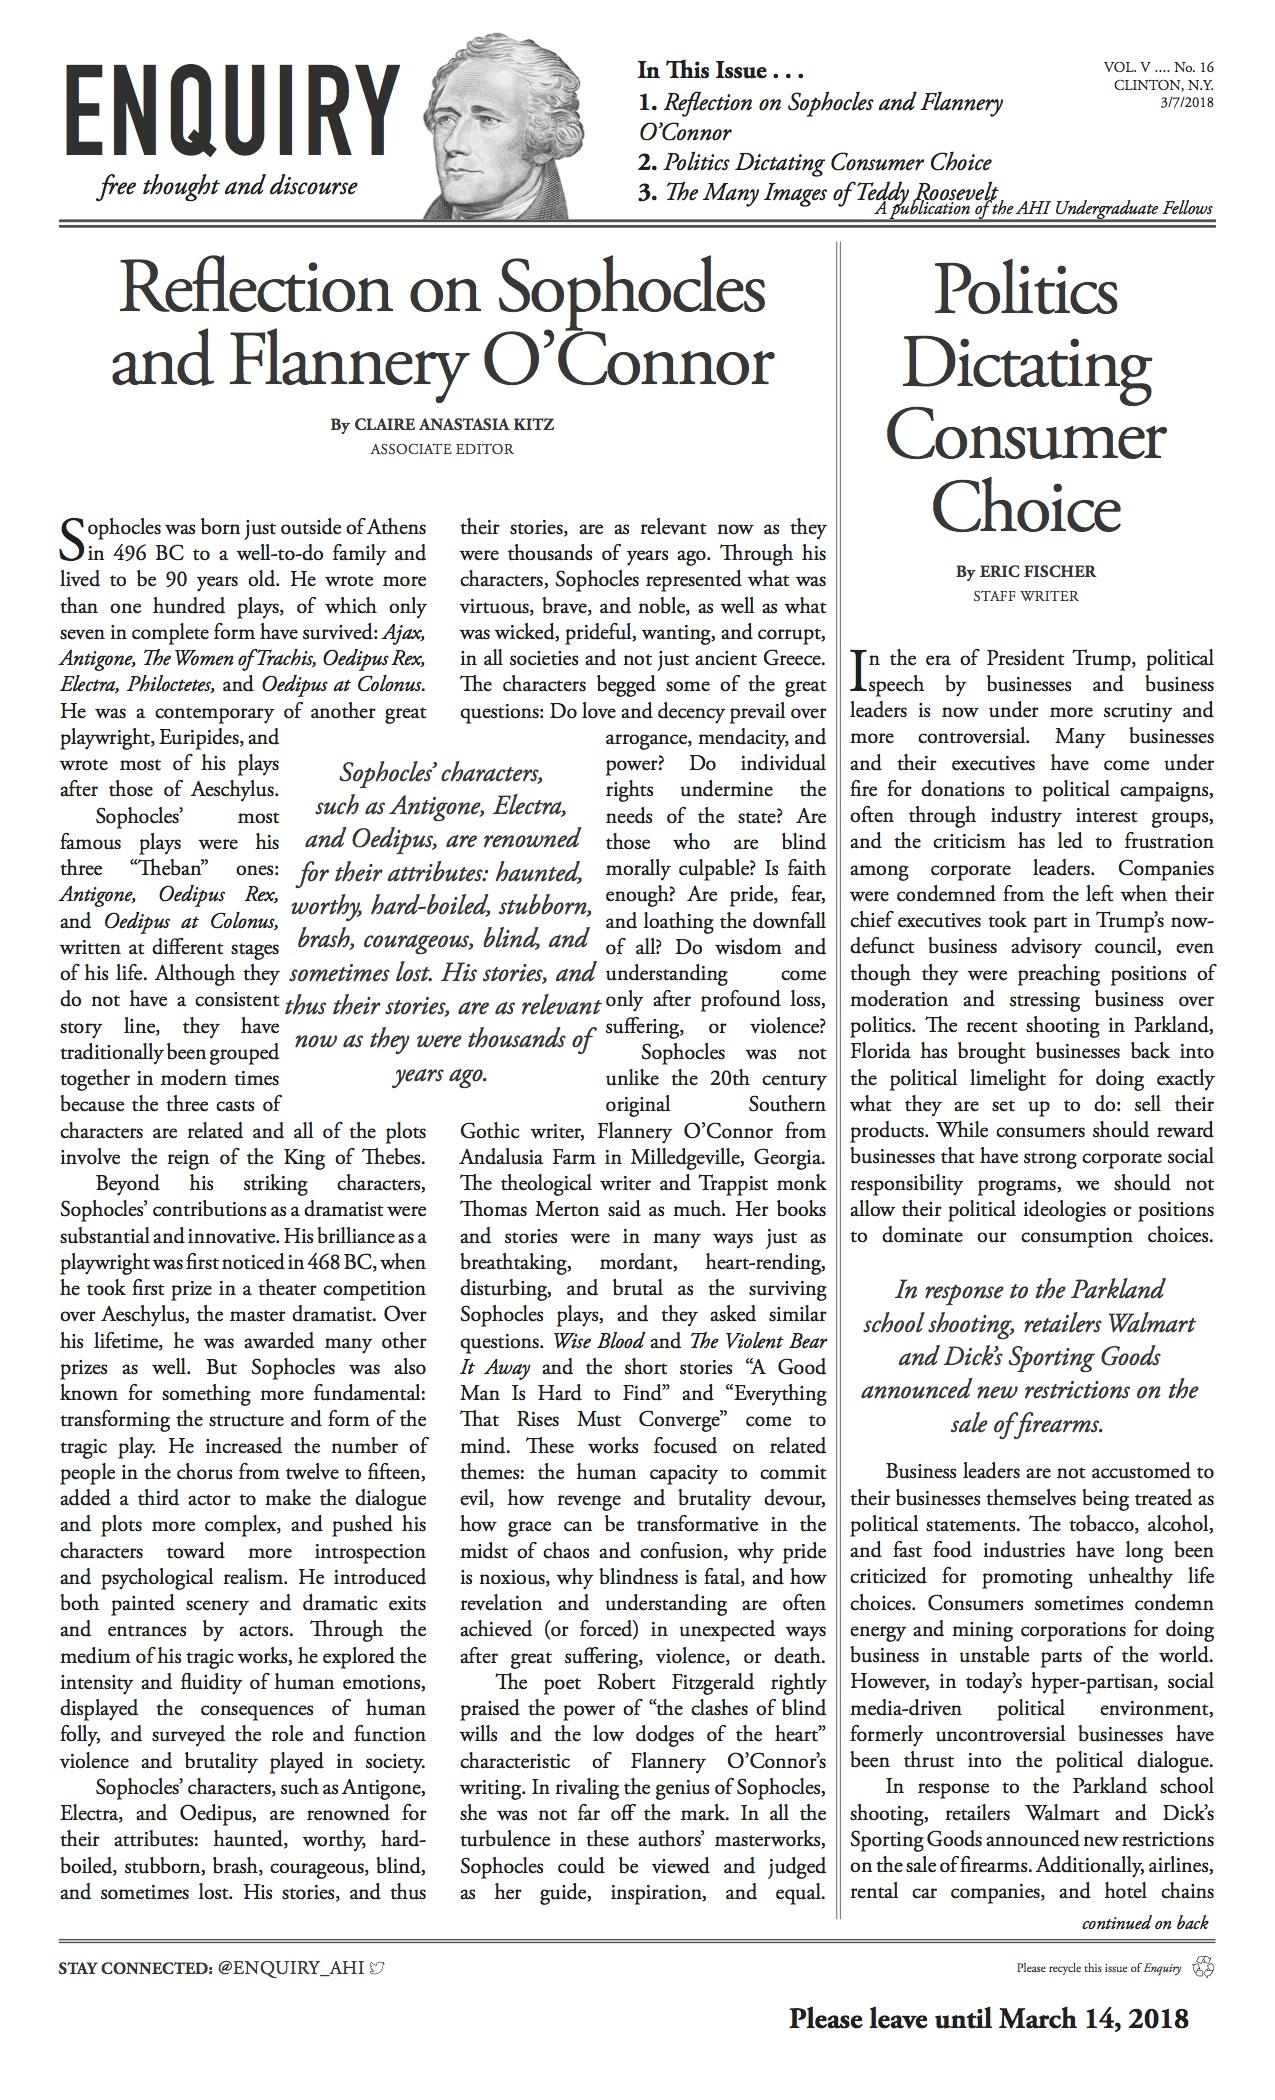 Enquiry Vol 5 No 16 front.jpg